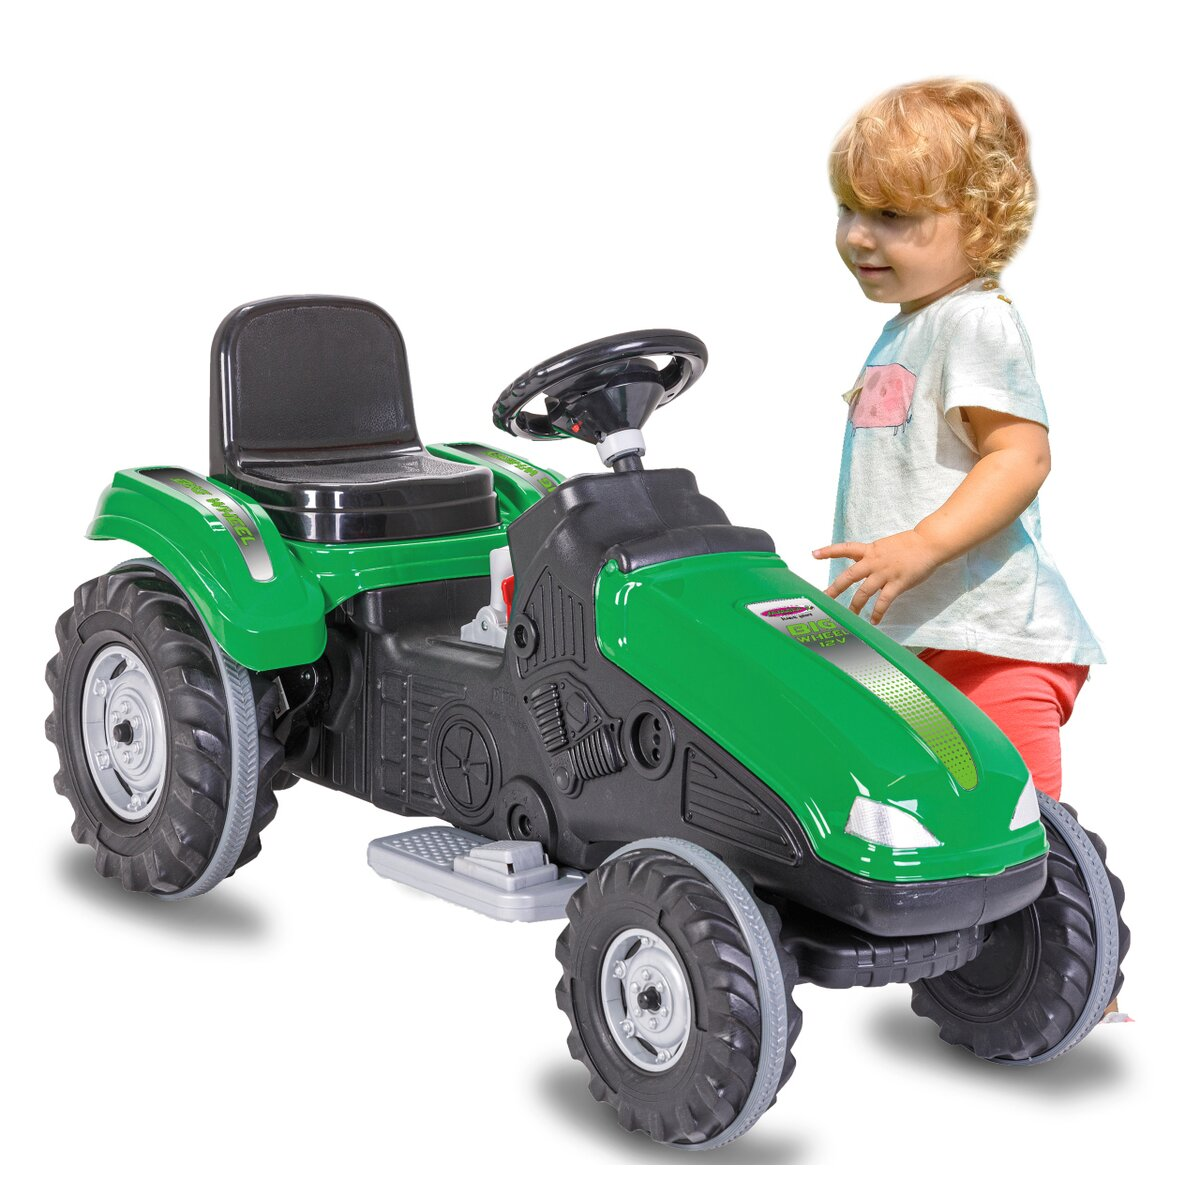 Jamara Ride-on Traktor Big Wheel 12V zelený